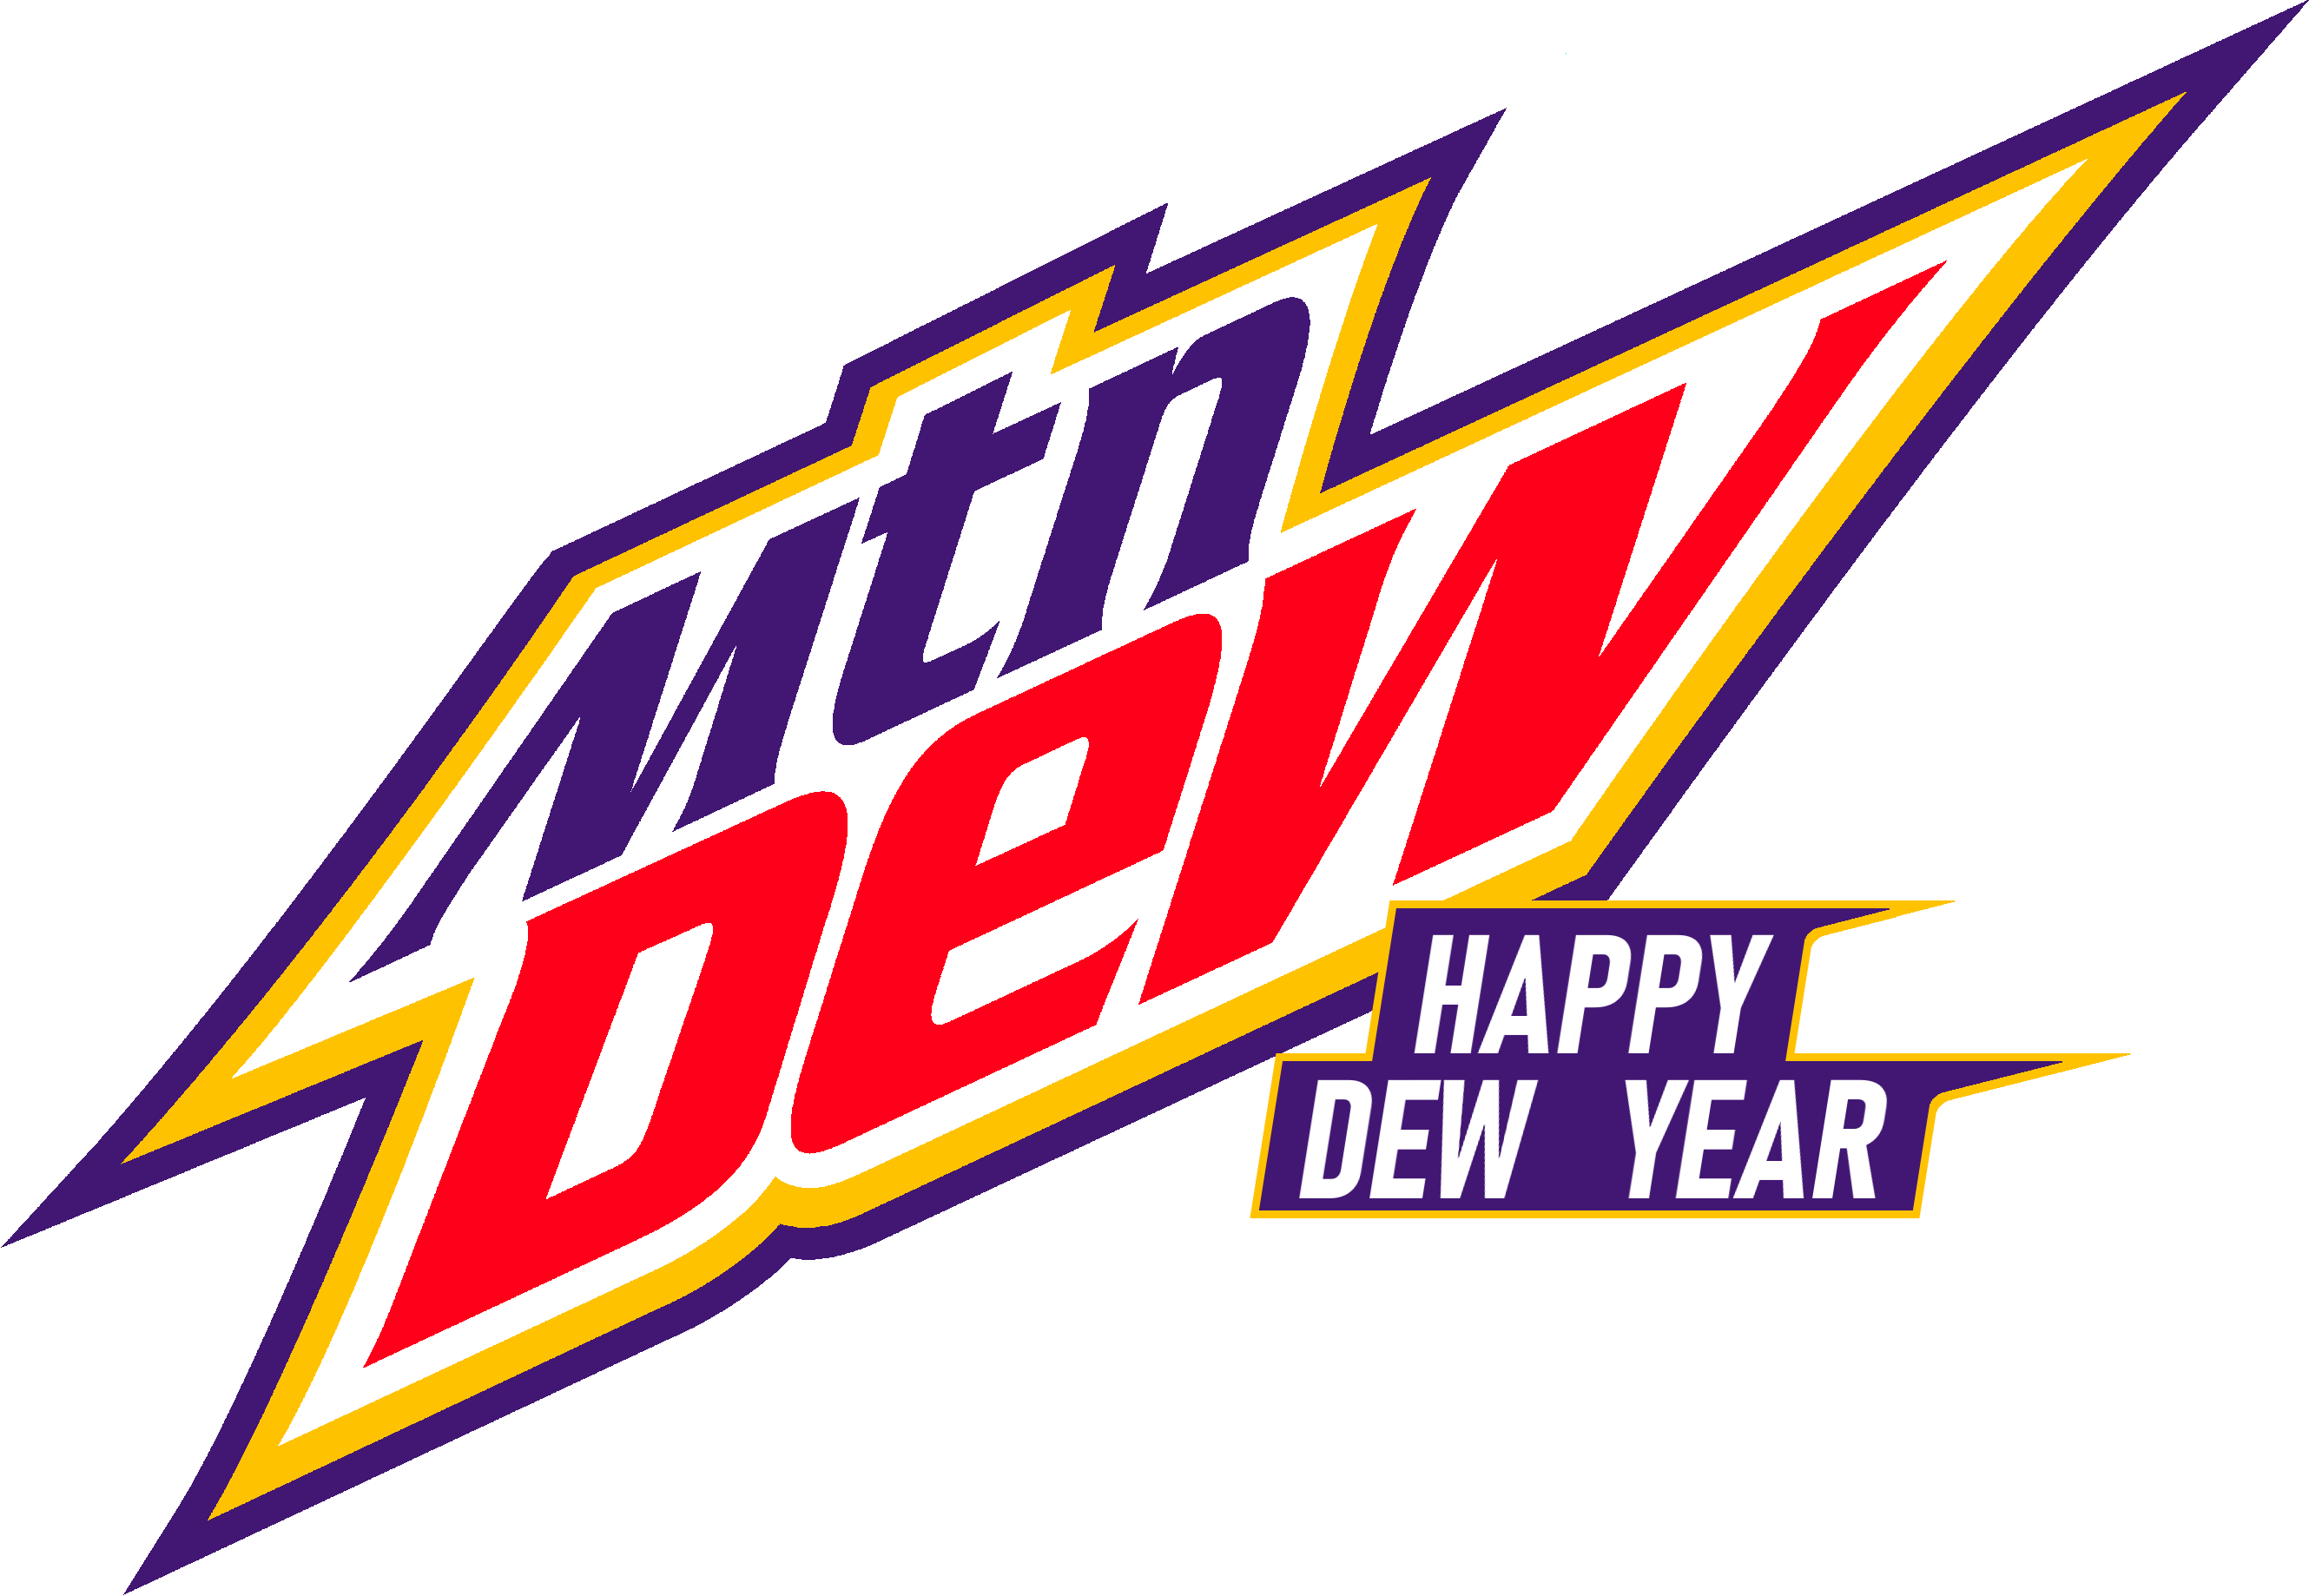 Happy Dew Year